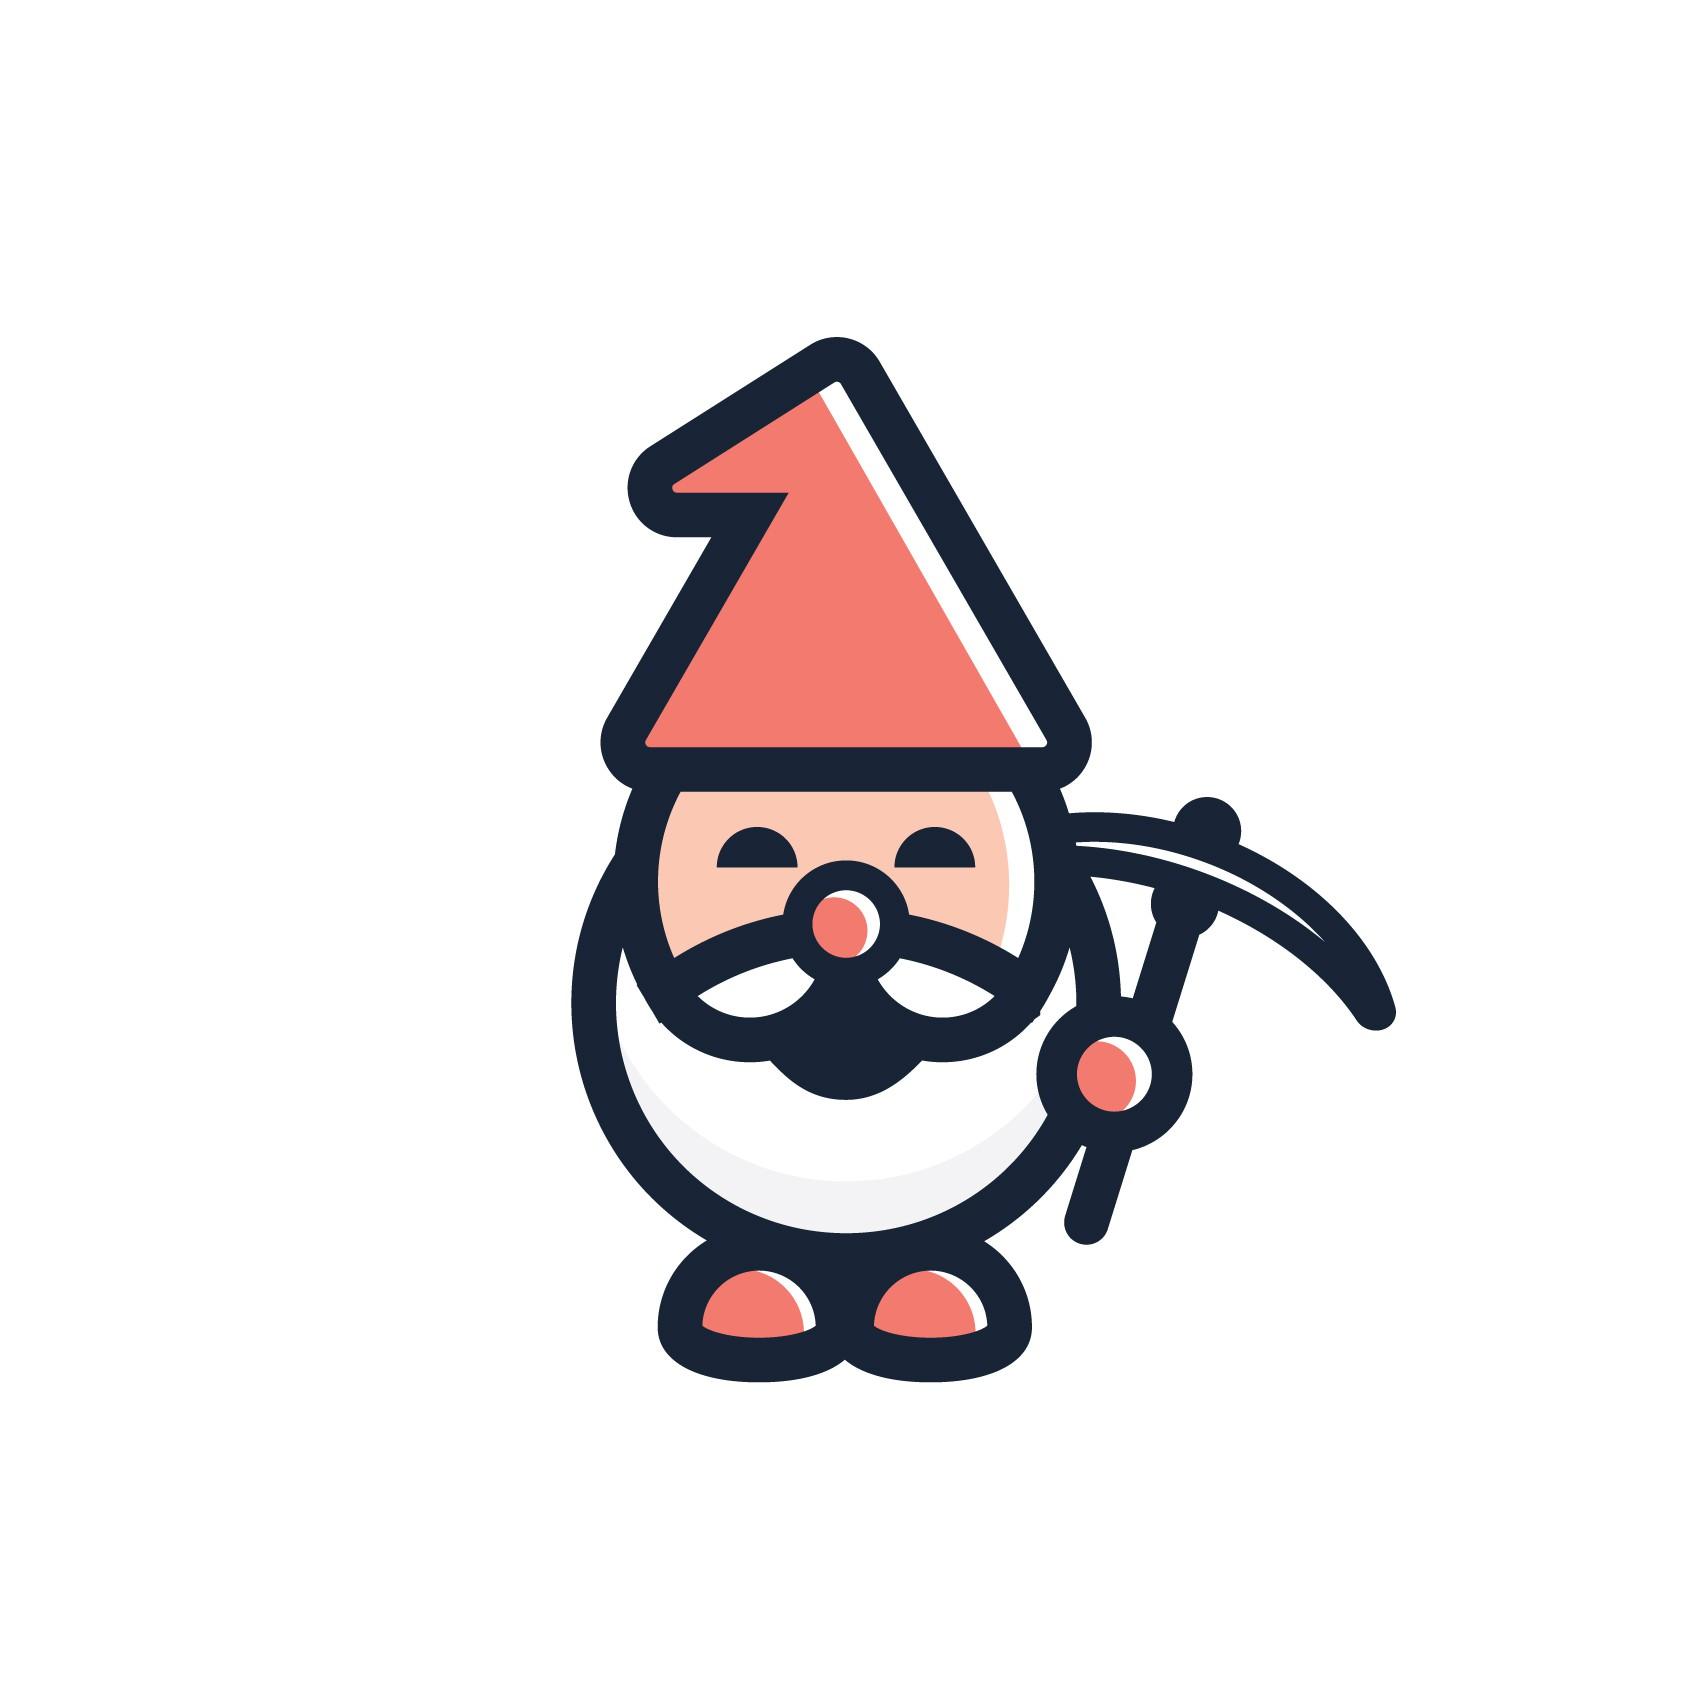 Give our Dwarfs their identity!